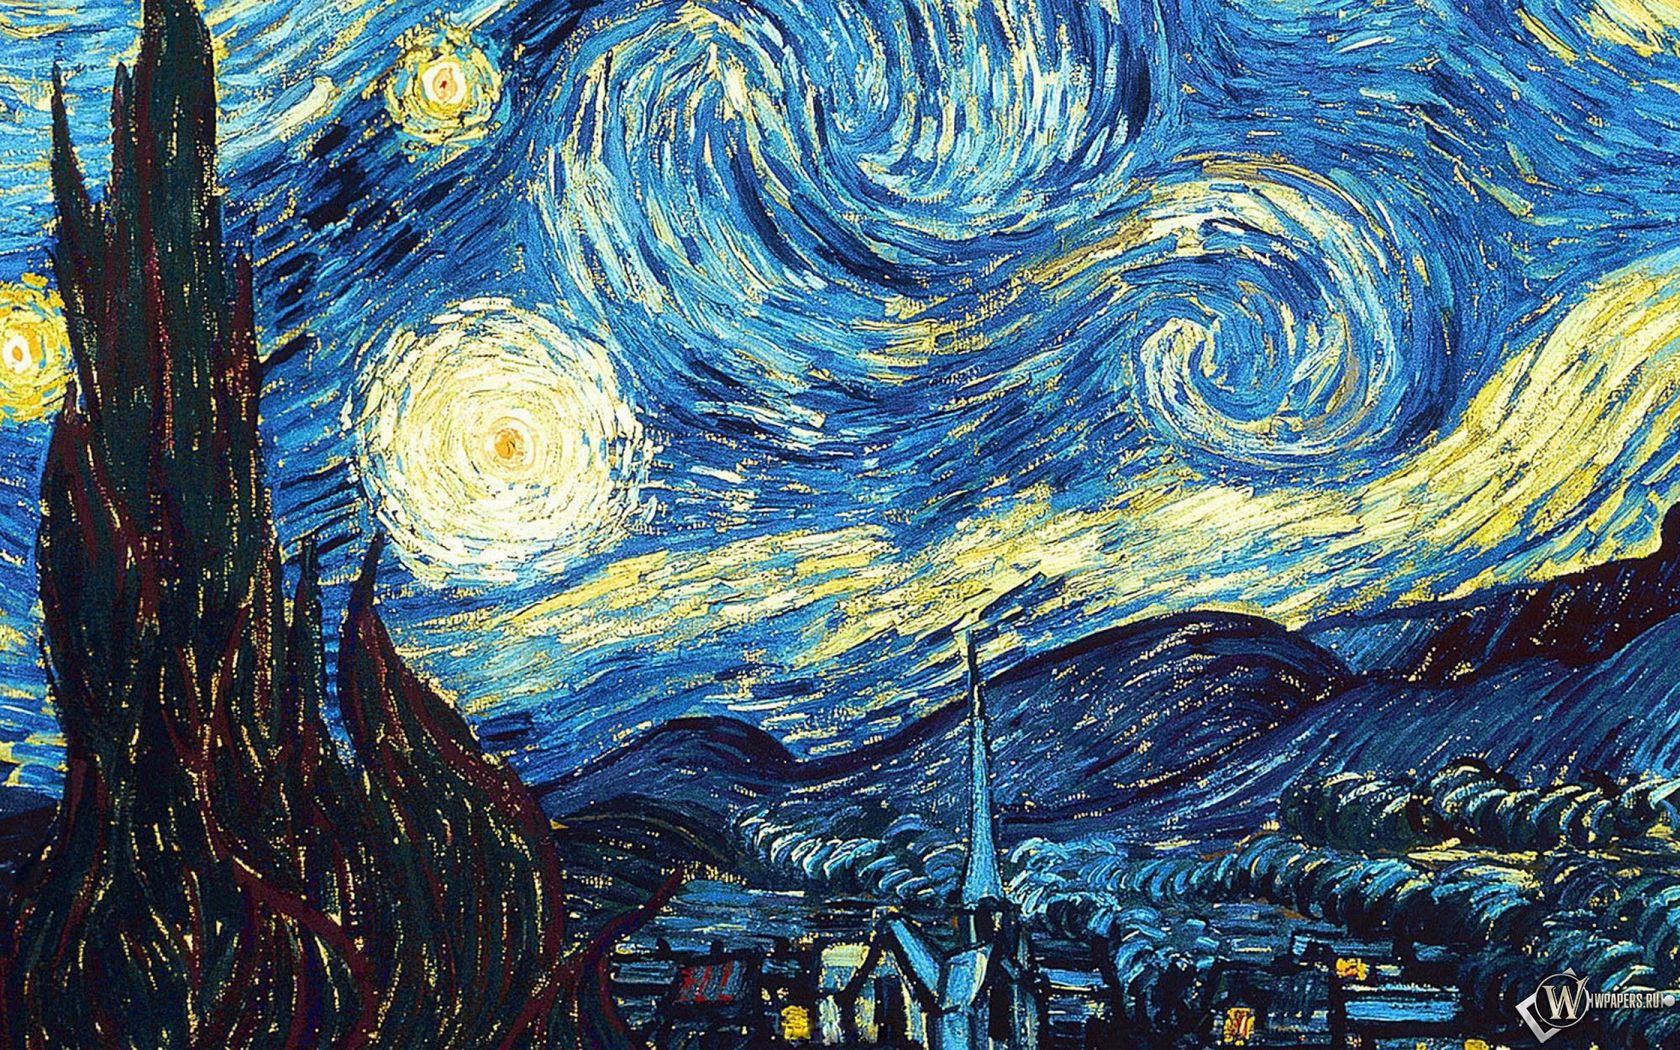 1680x1050 Wallpaper vincent van gogh, the starry night, oil, canvas